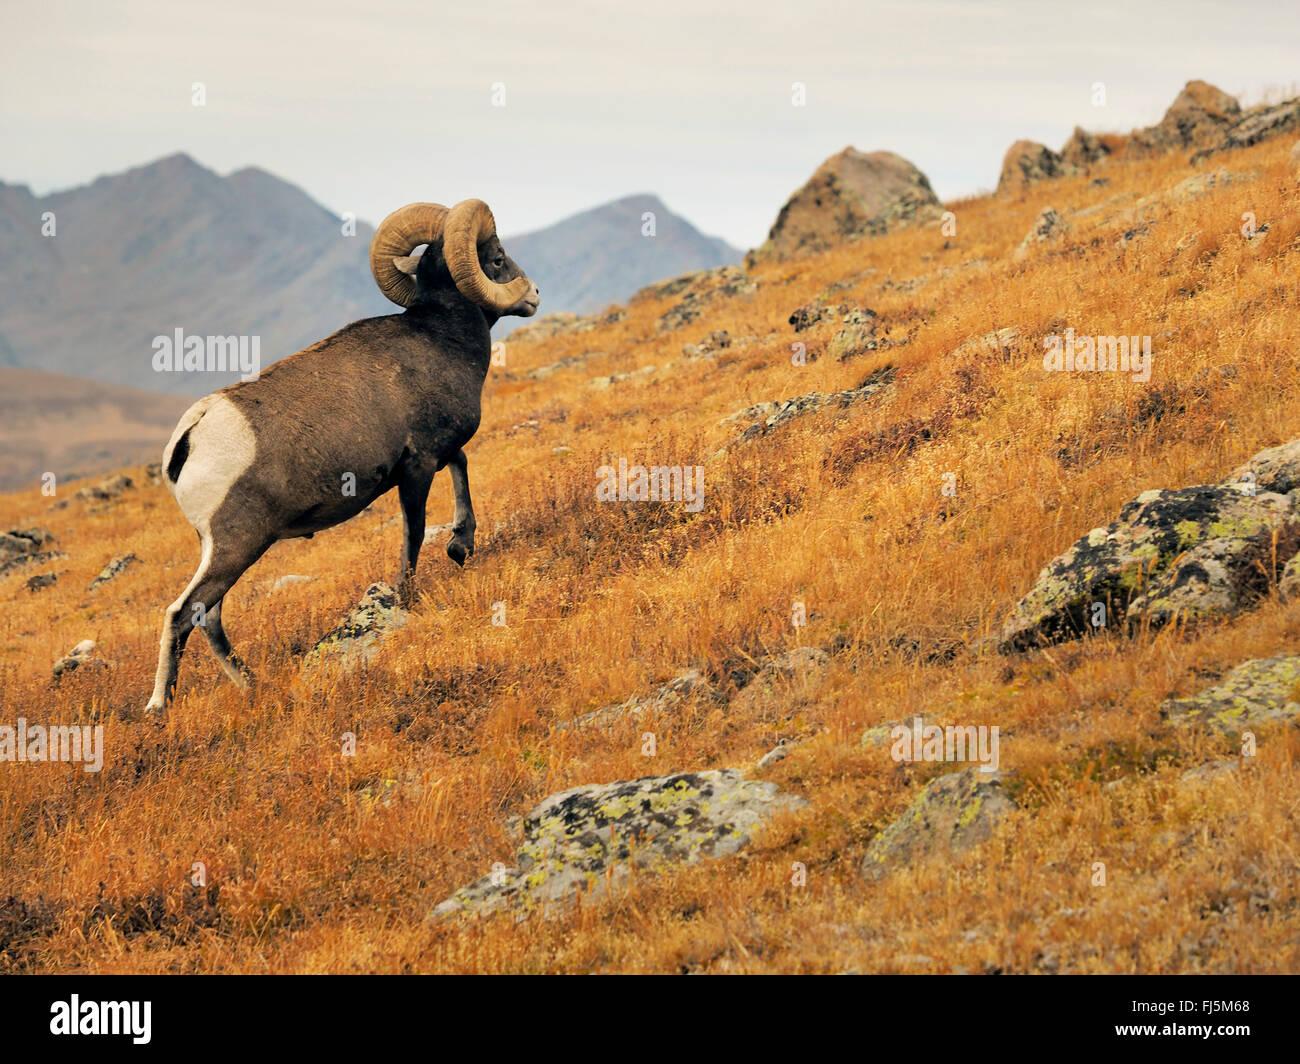 bighorn sheep, American bighorn, mountain sheep (Ovis canadensis), male, USA, Colorado, Rocky Mountain National - Stock Image